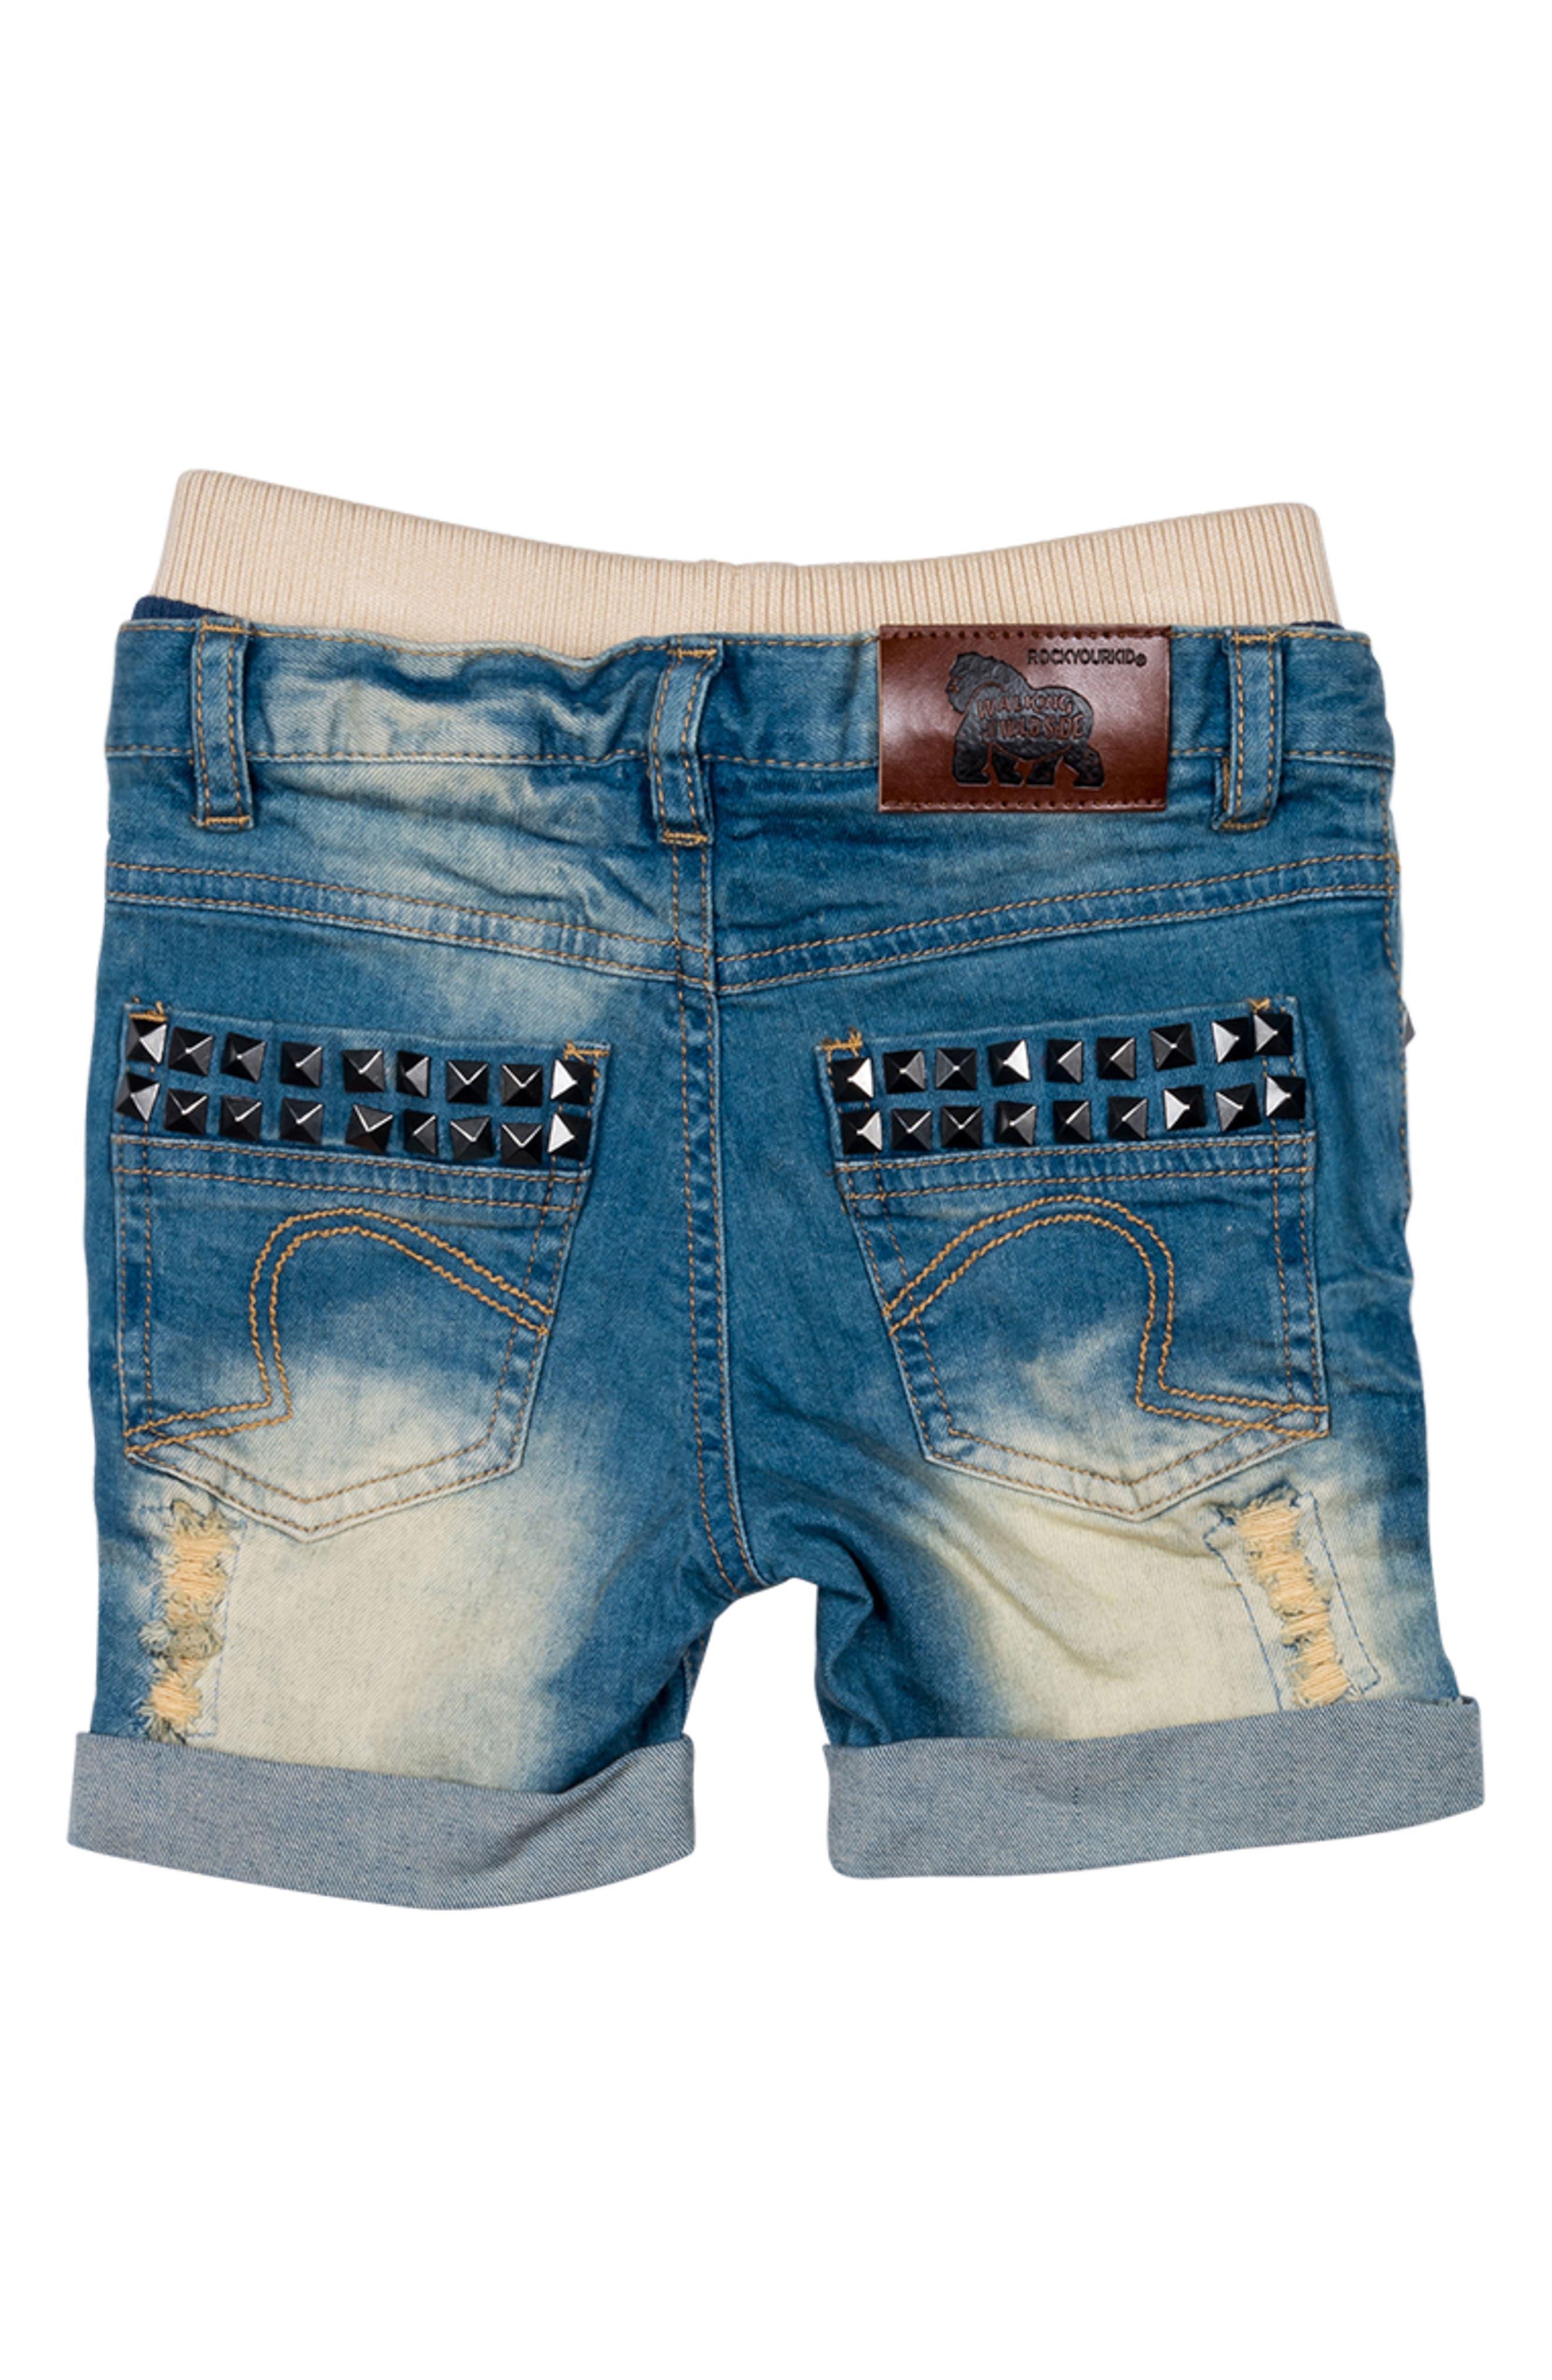 Heavy Metal Denim Shorts,                             Alternate thumbnail 2, color,                             400